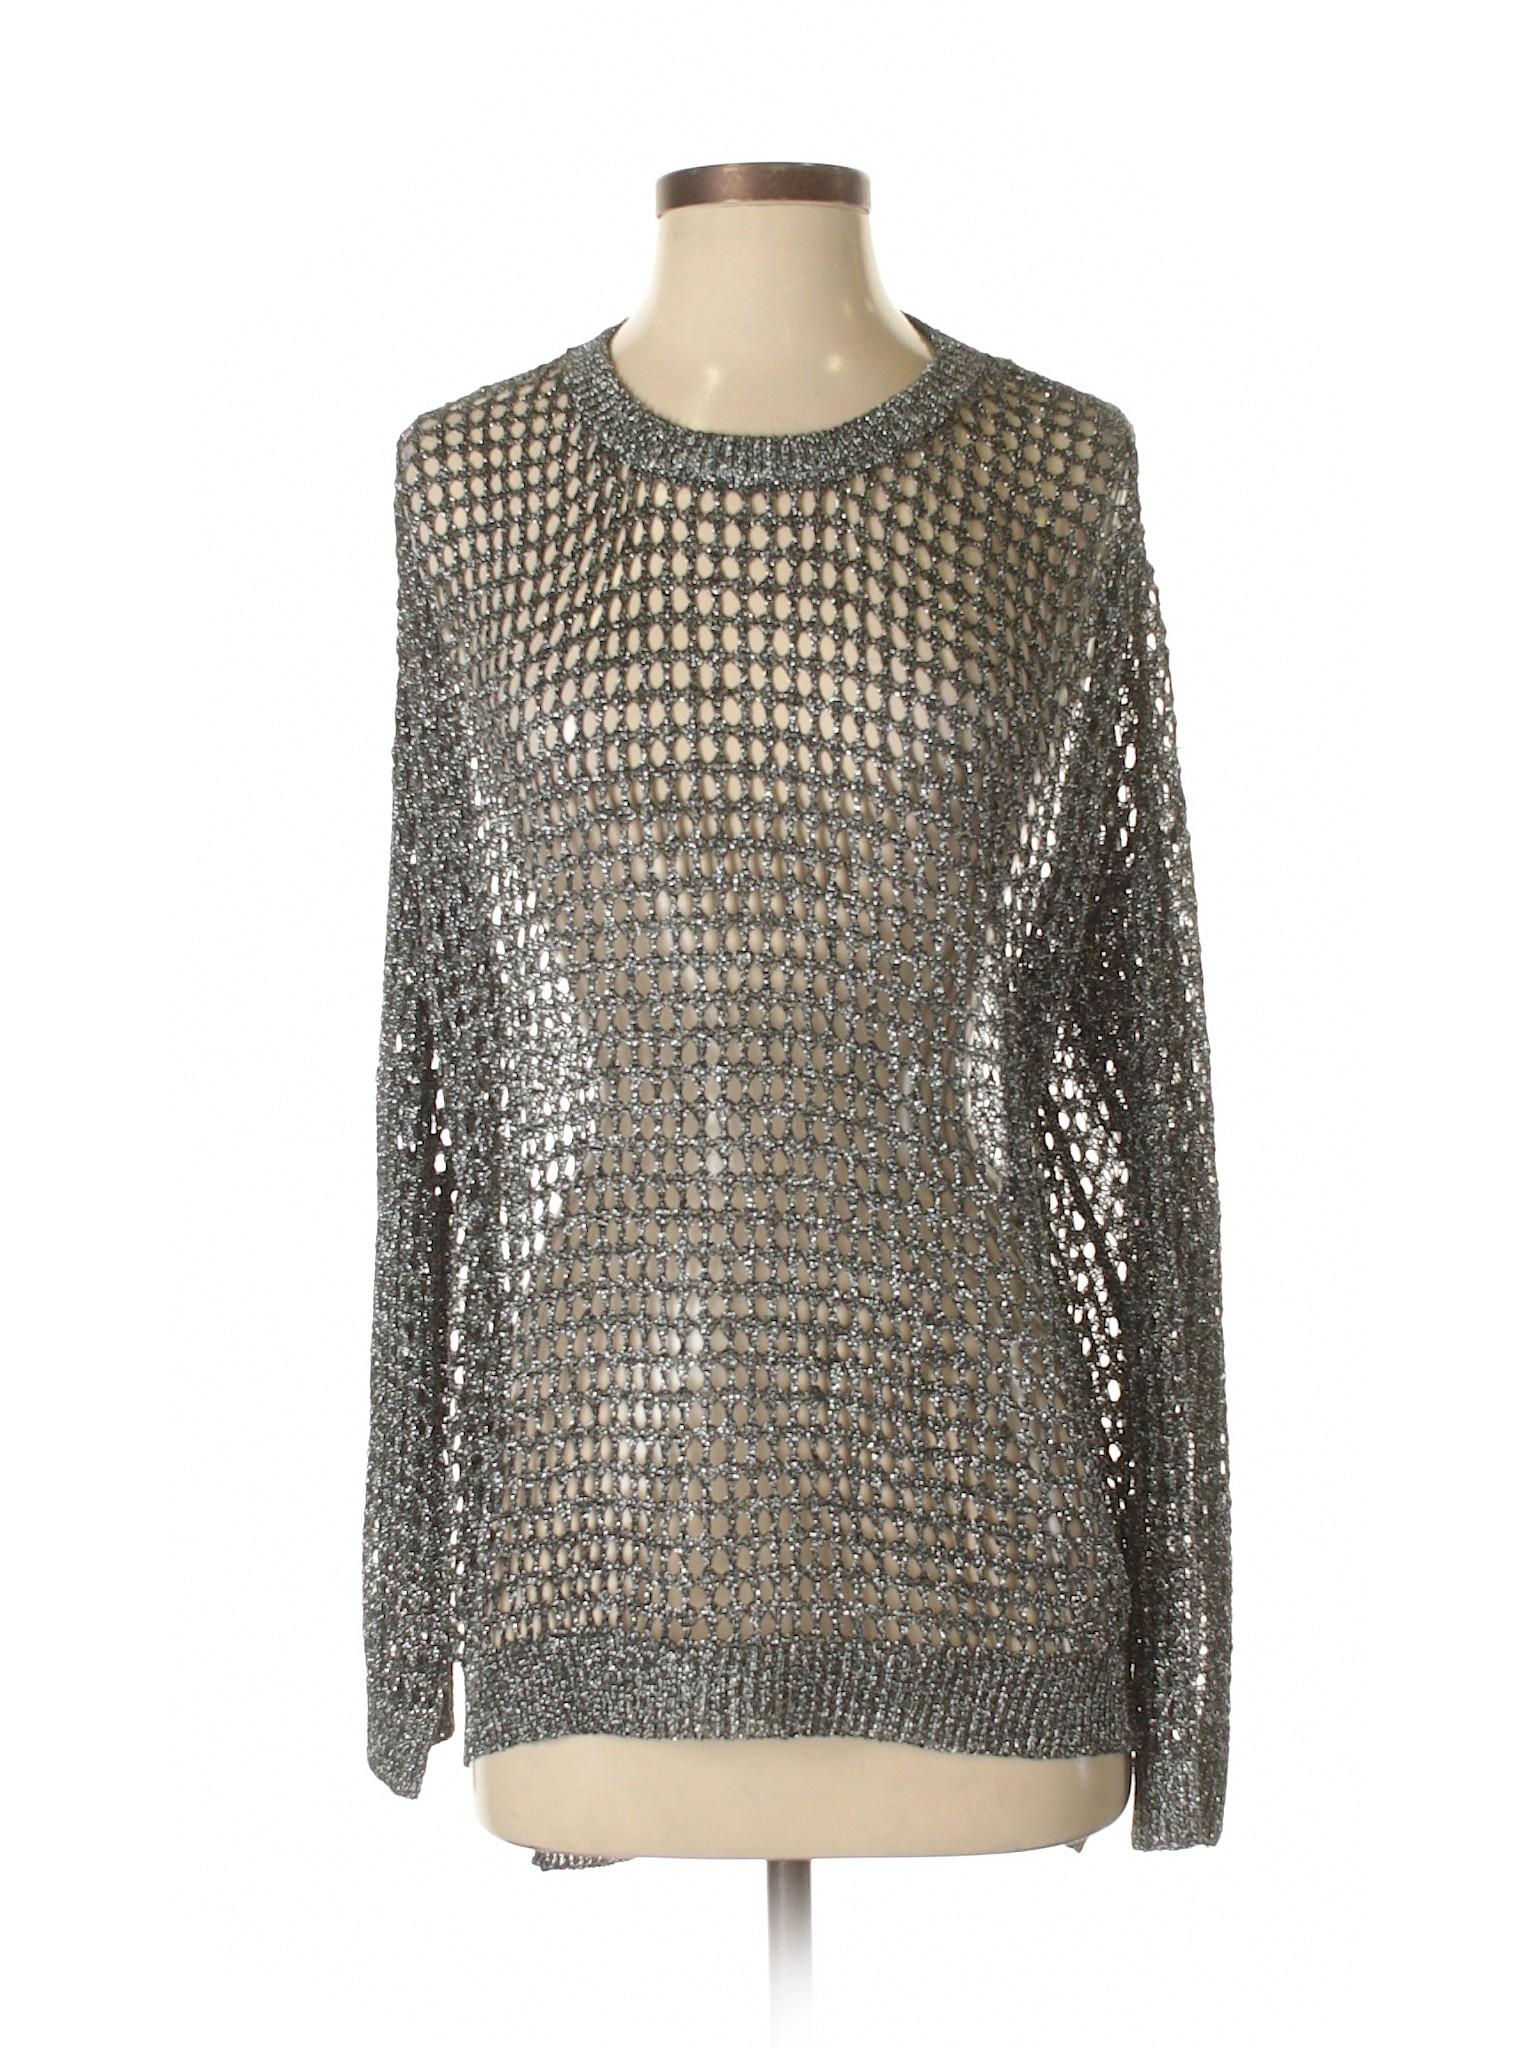 Sweater Boutique Kane Boutique Pullover Karen Karen T6w8Fp